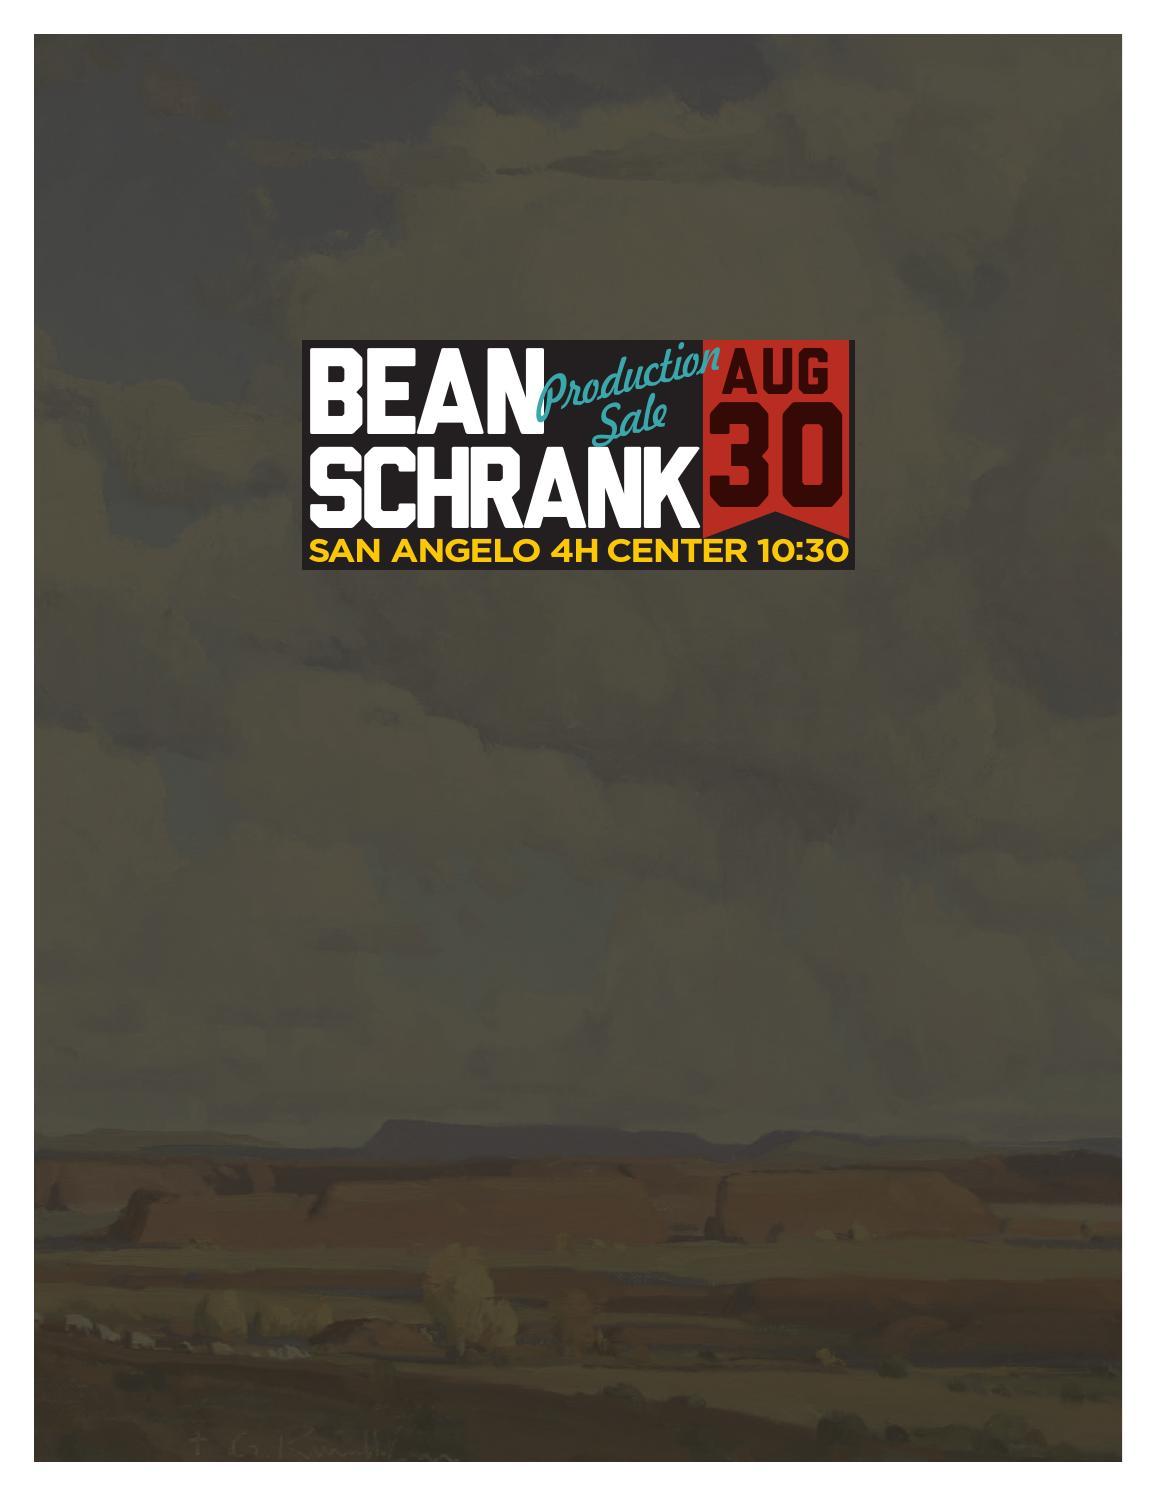 Beanschrank2014 By Beanschrank Issuu